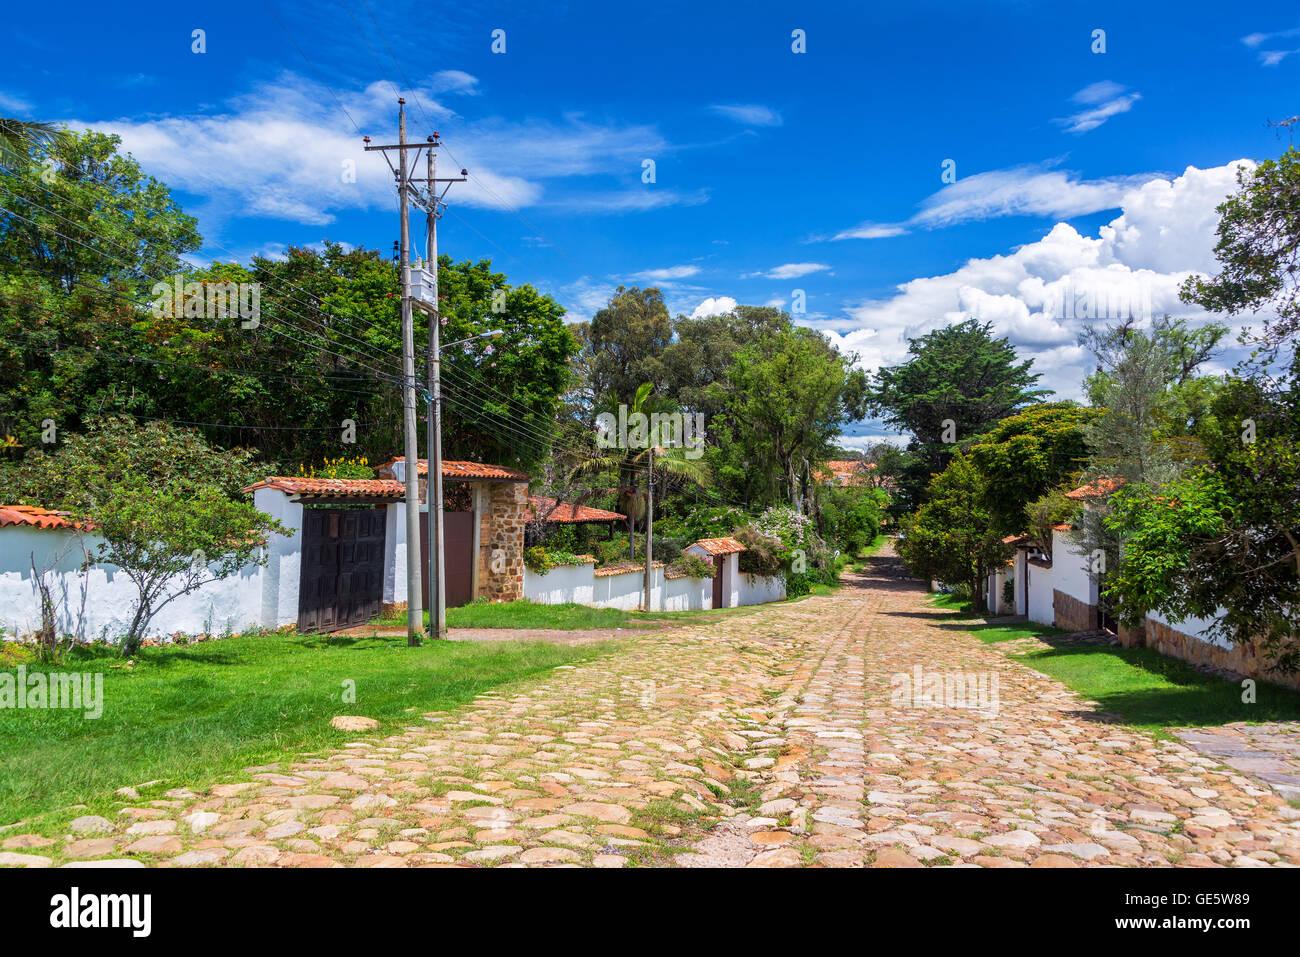 Cobblestone street in a quiet neighborhood of Villa de Leyva, Colombia - Stock Image